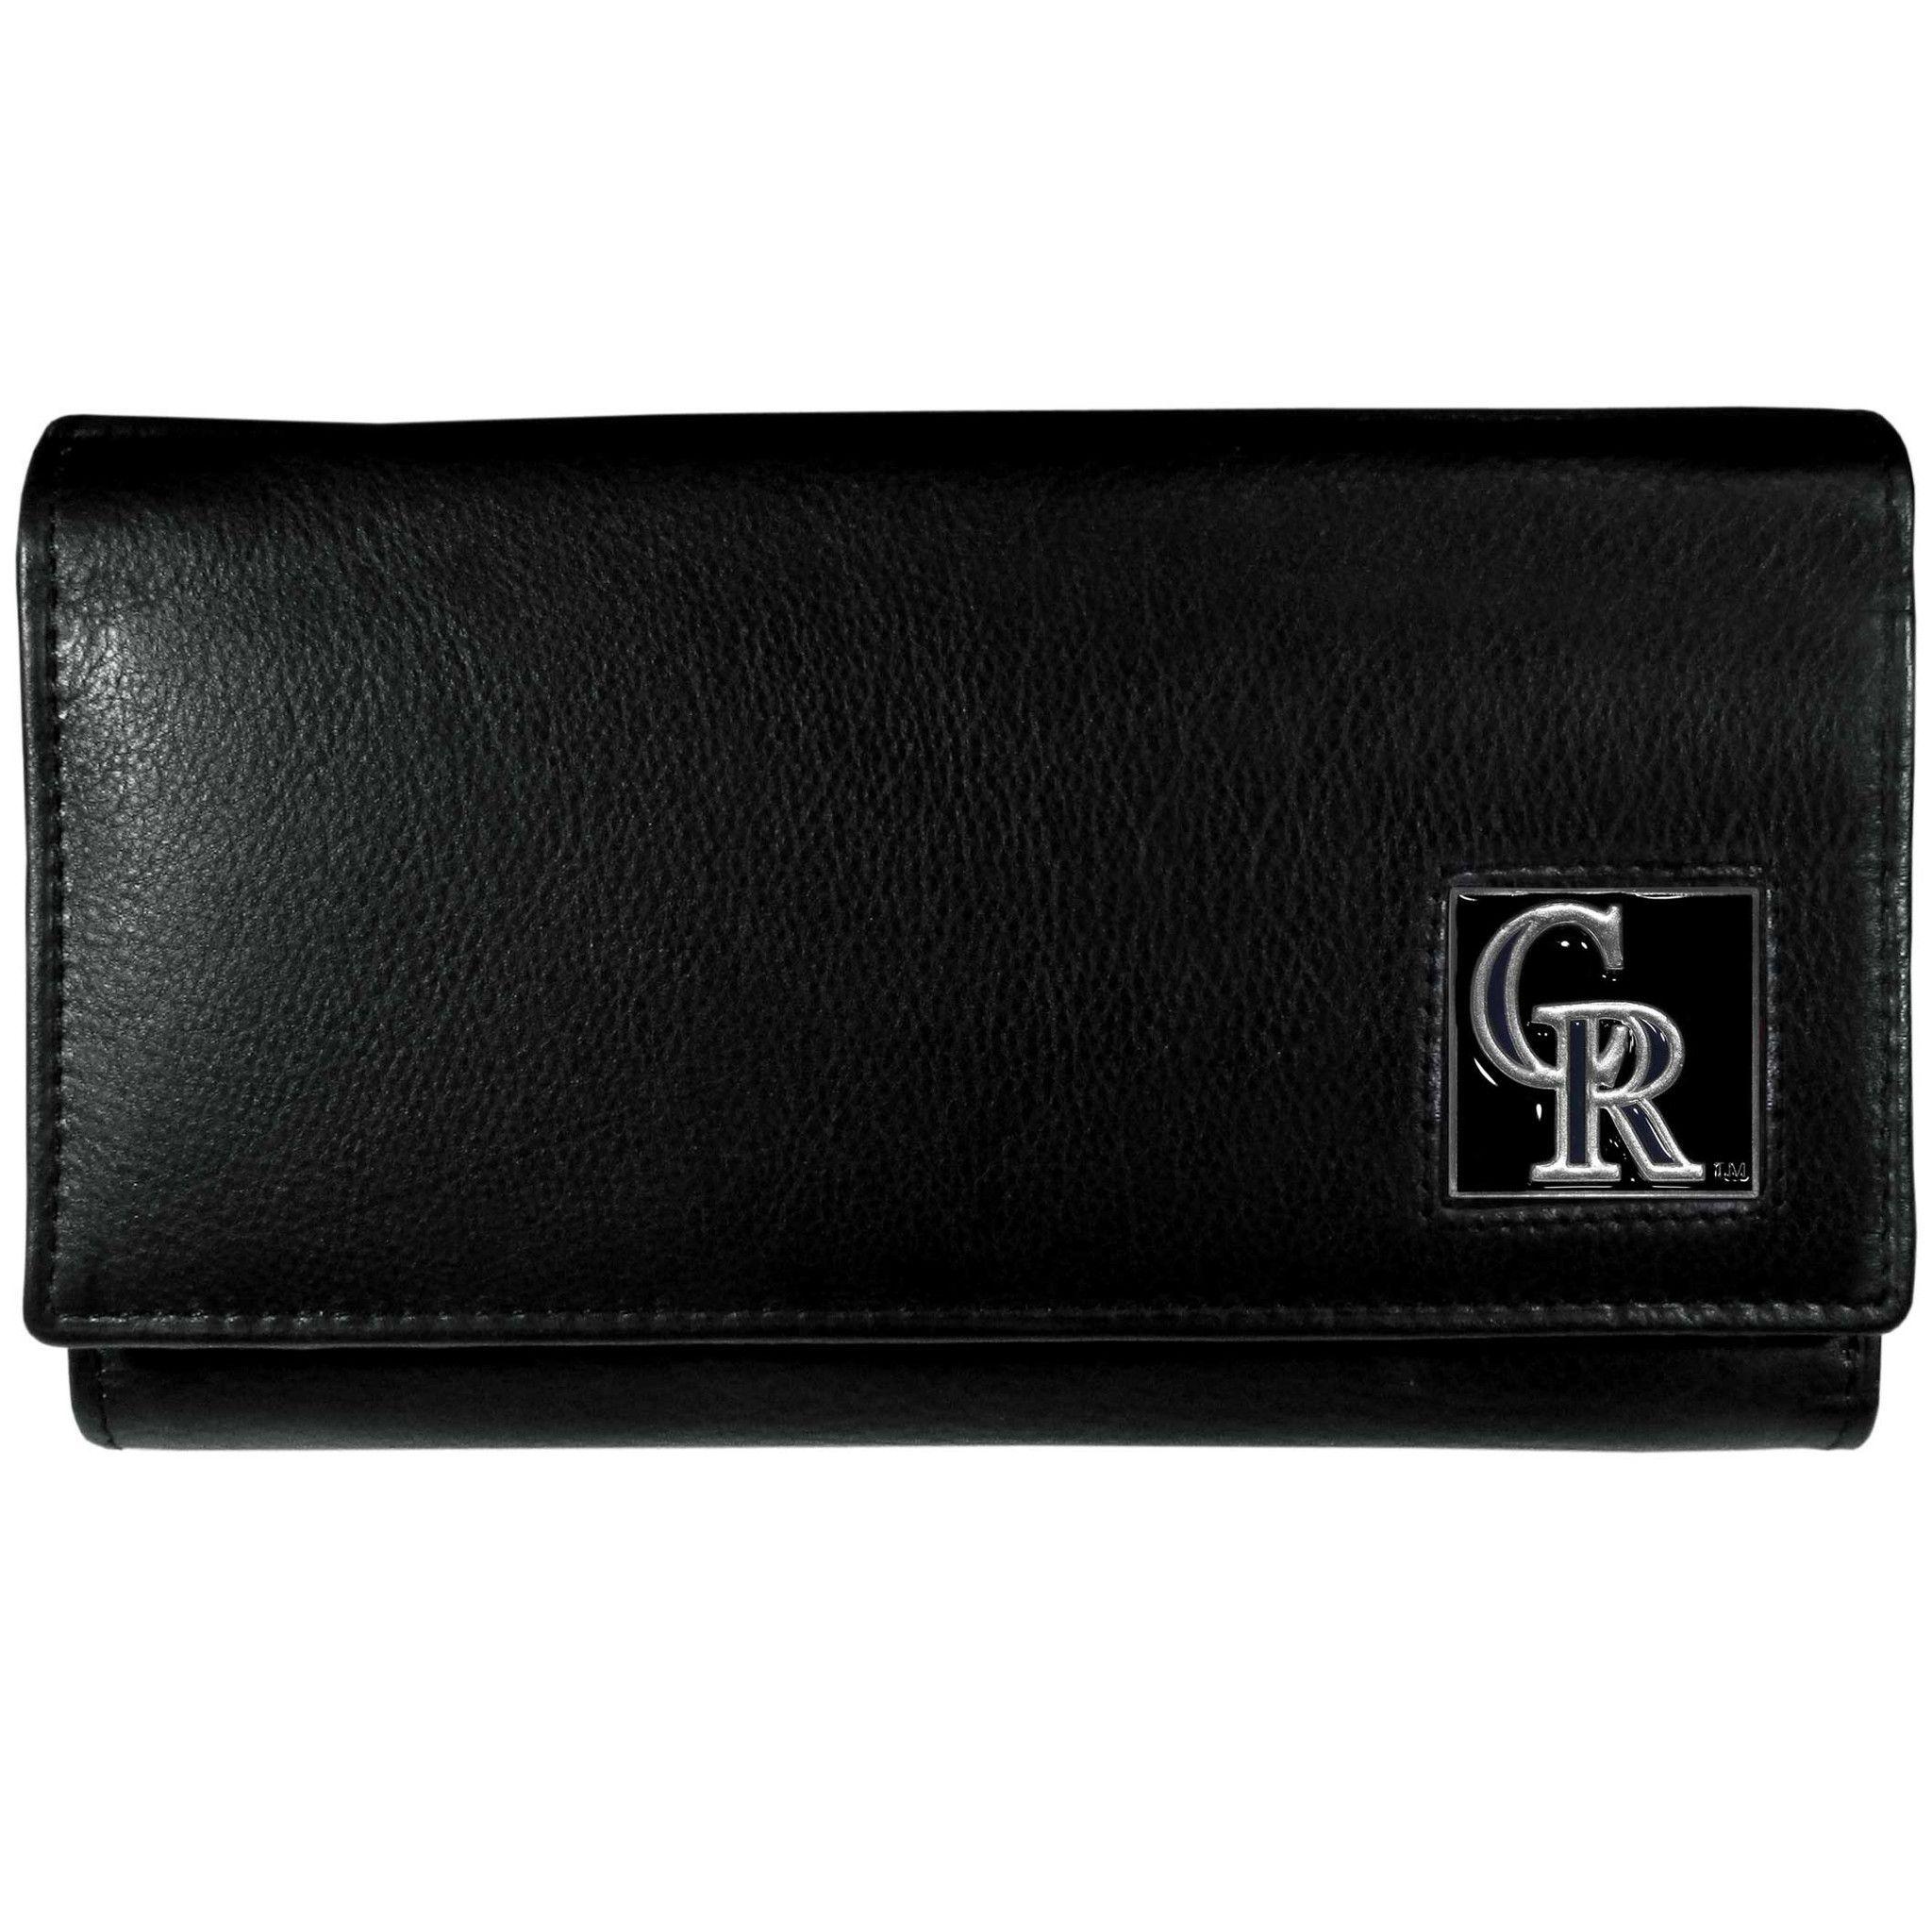 Colorado Rockies Leather Women's Wallet